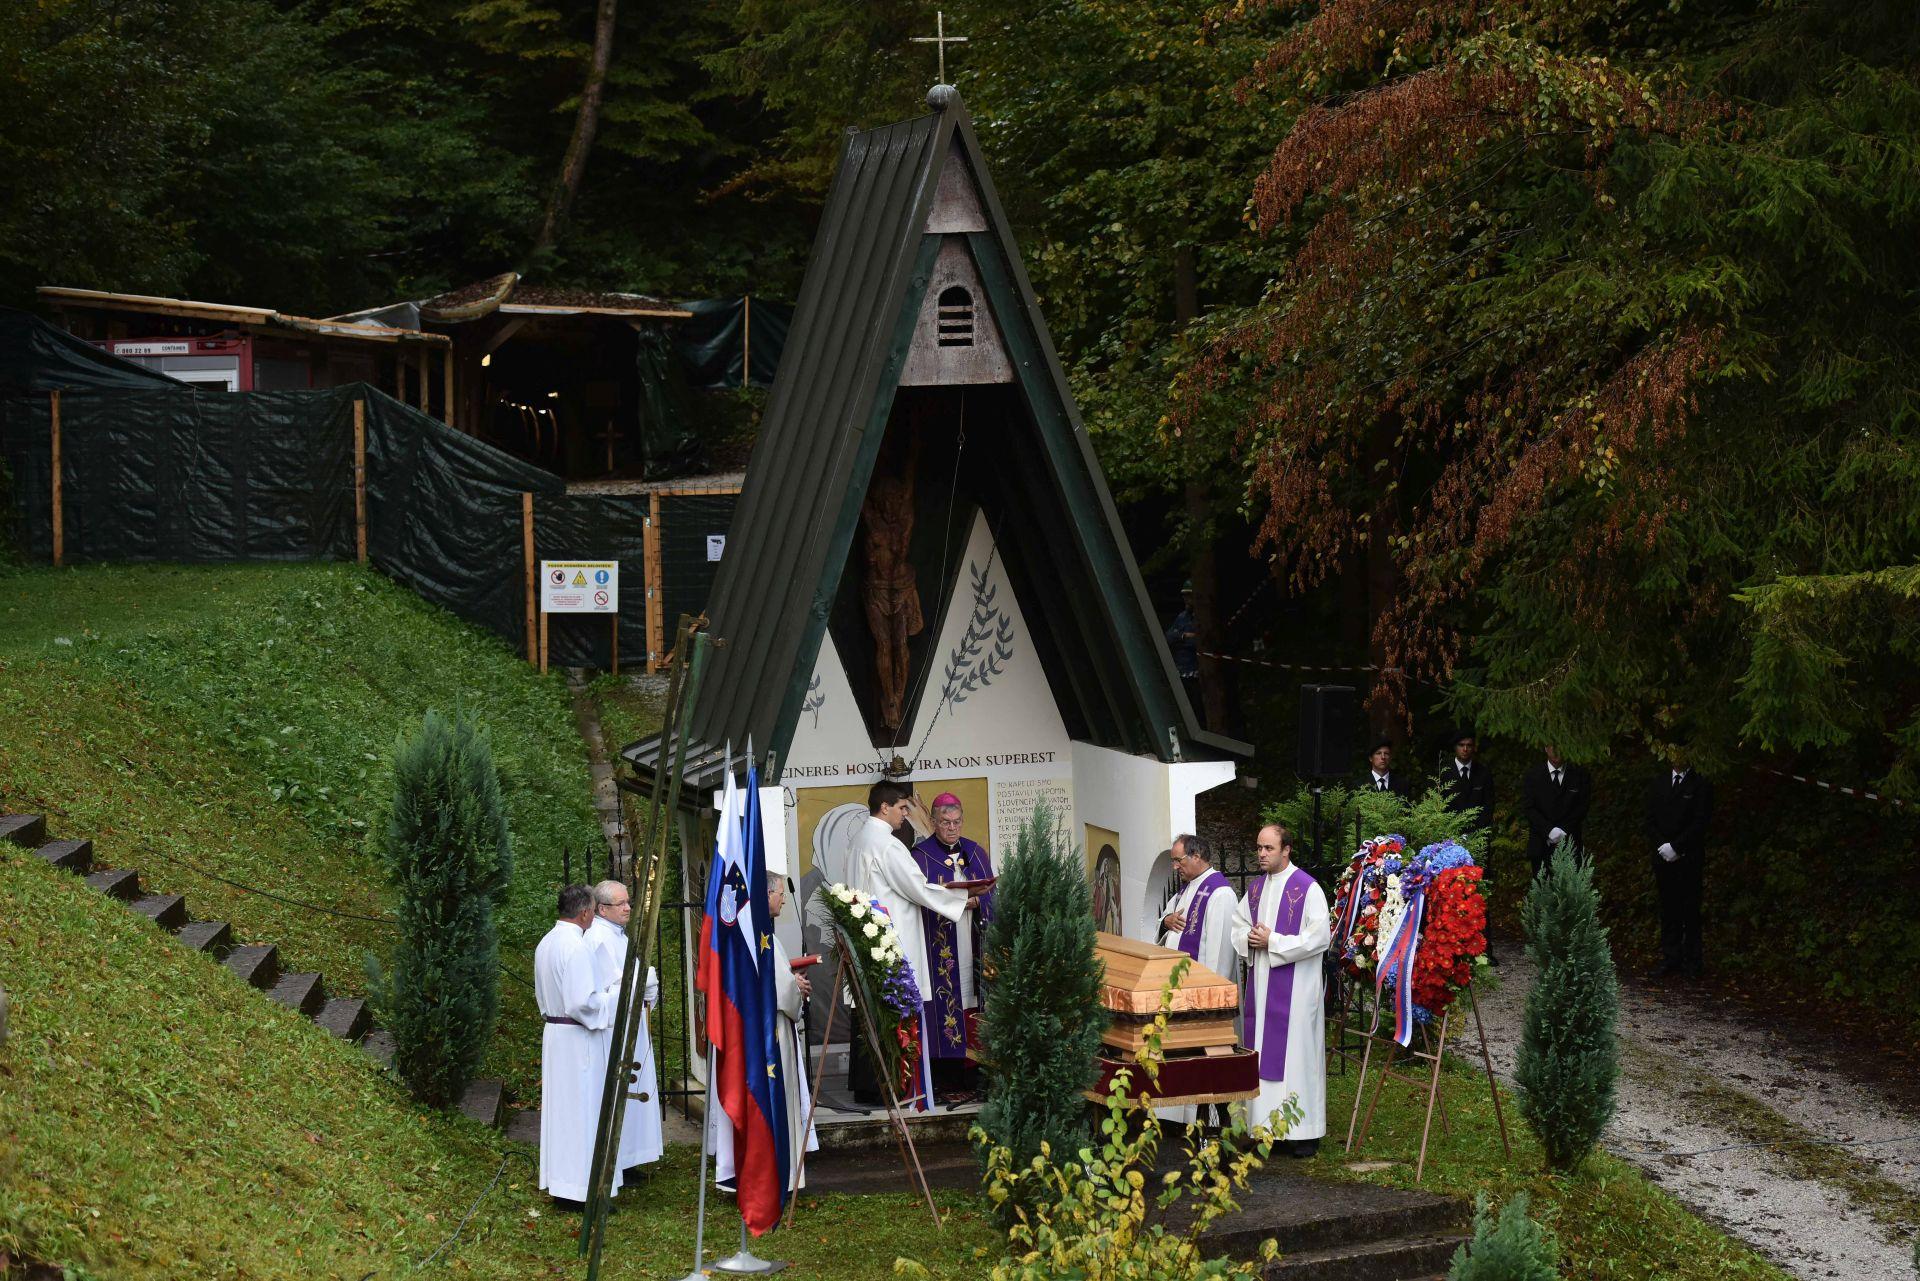 POČETAK PROCESA POMIRENJA: Slovenski biskupi pozdravili pokapanje žrtava Hude Jame